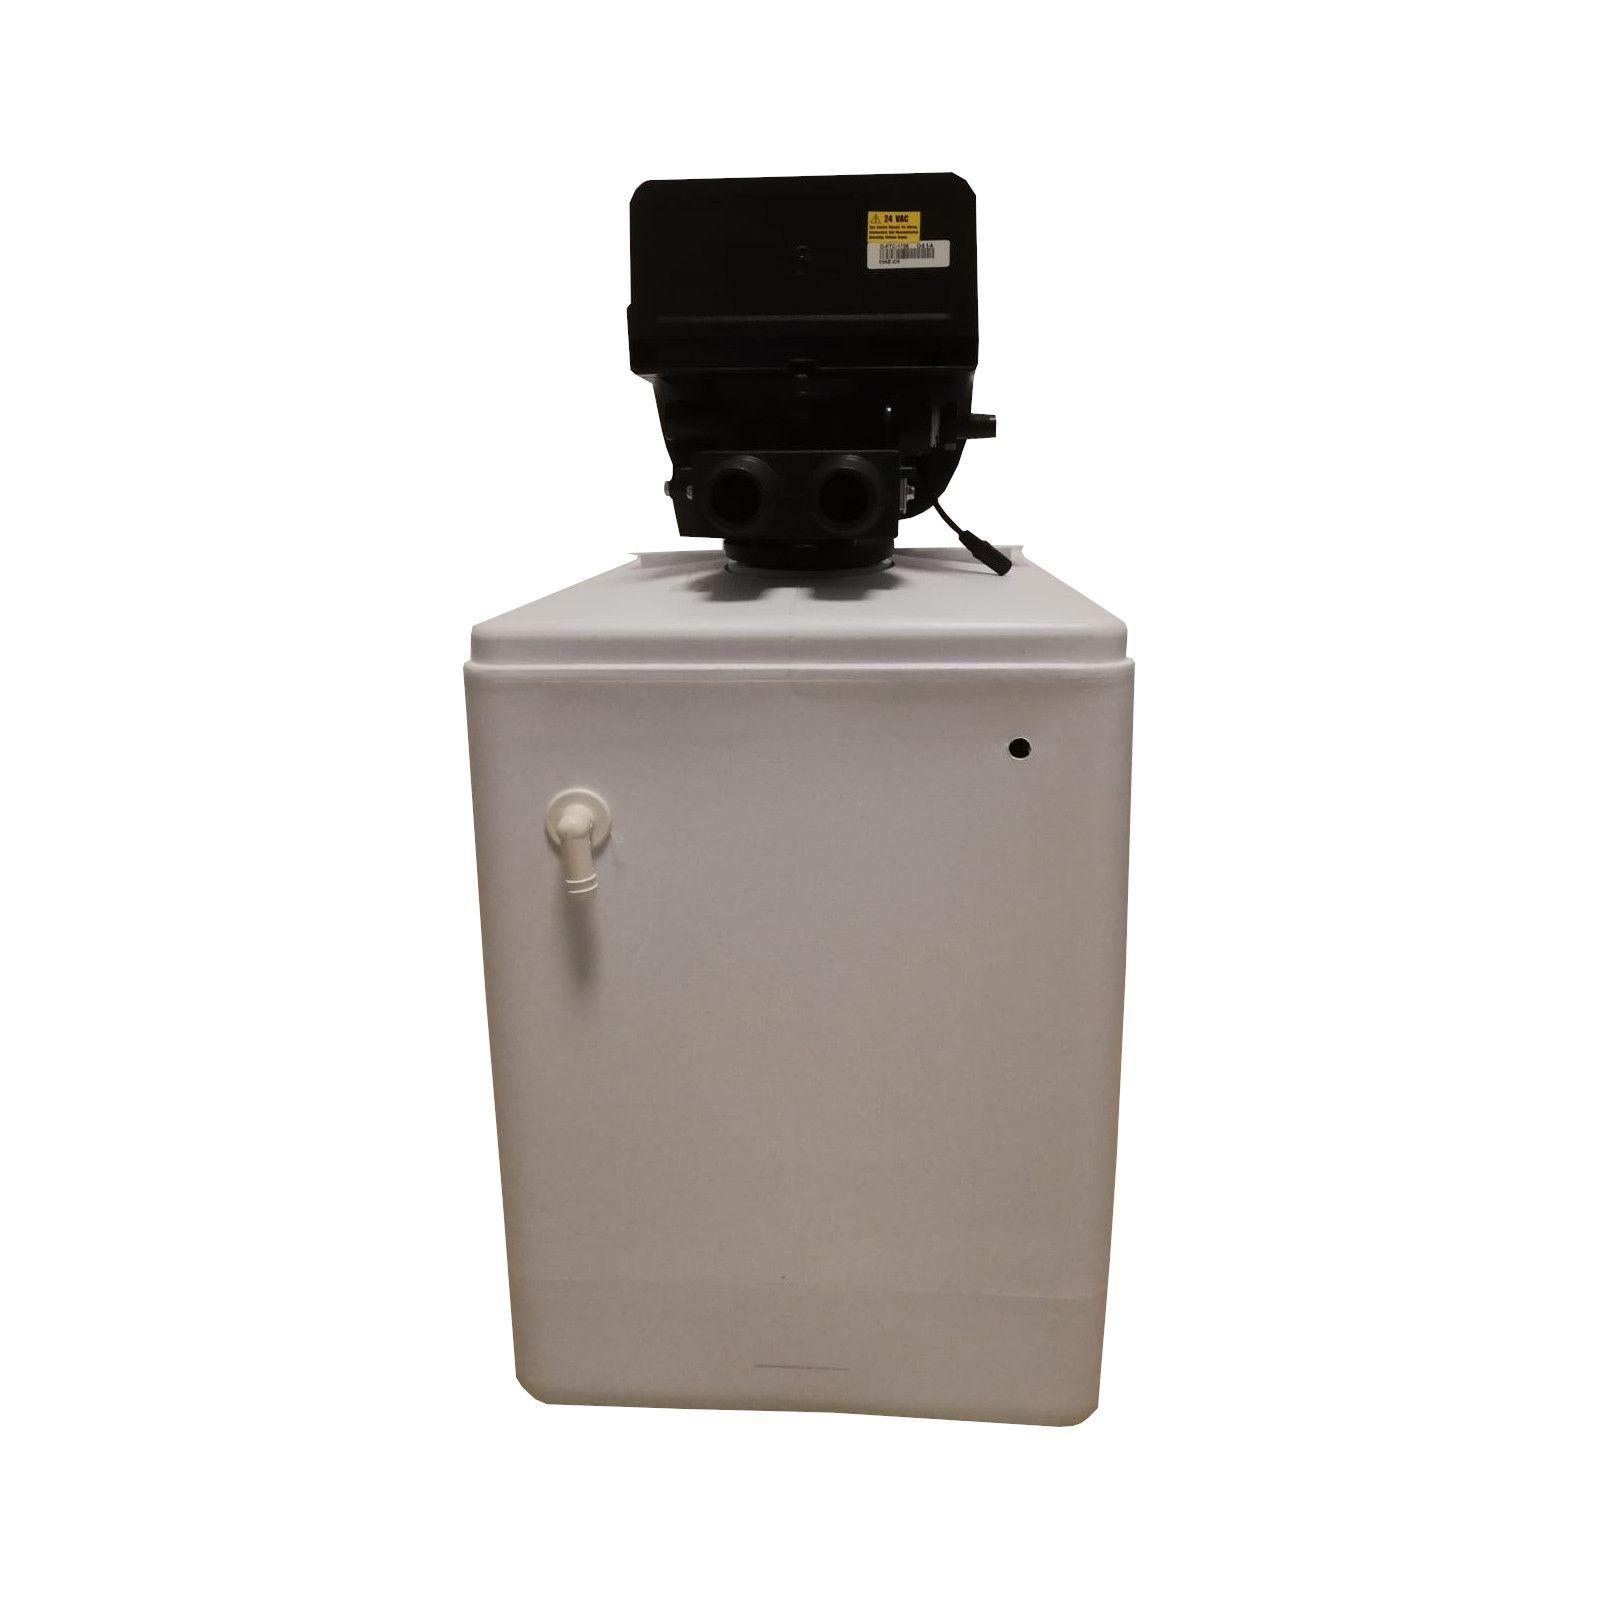 Dedurizator apa Aqua Mini 10-DM, Debit 0.6 mc/h, Capacitate filtrare 10.400 litri, Cartus din Rasina Cationica - AquaFilters.ro